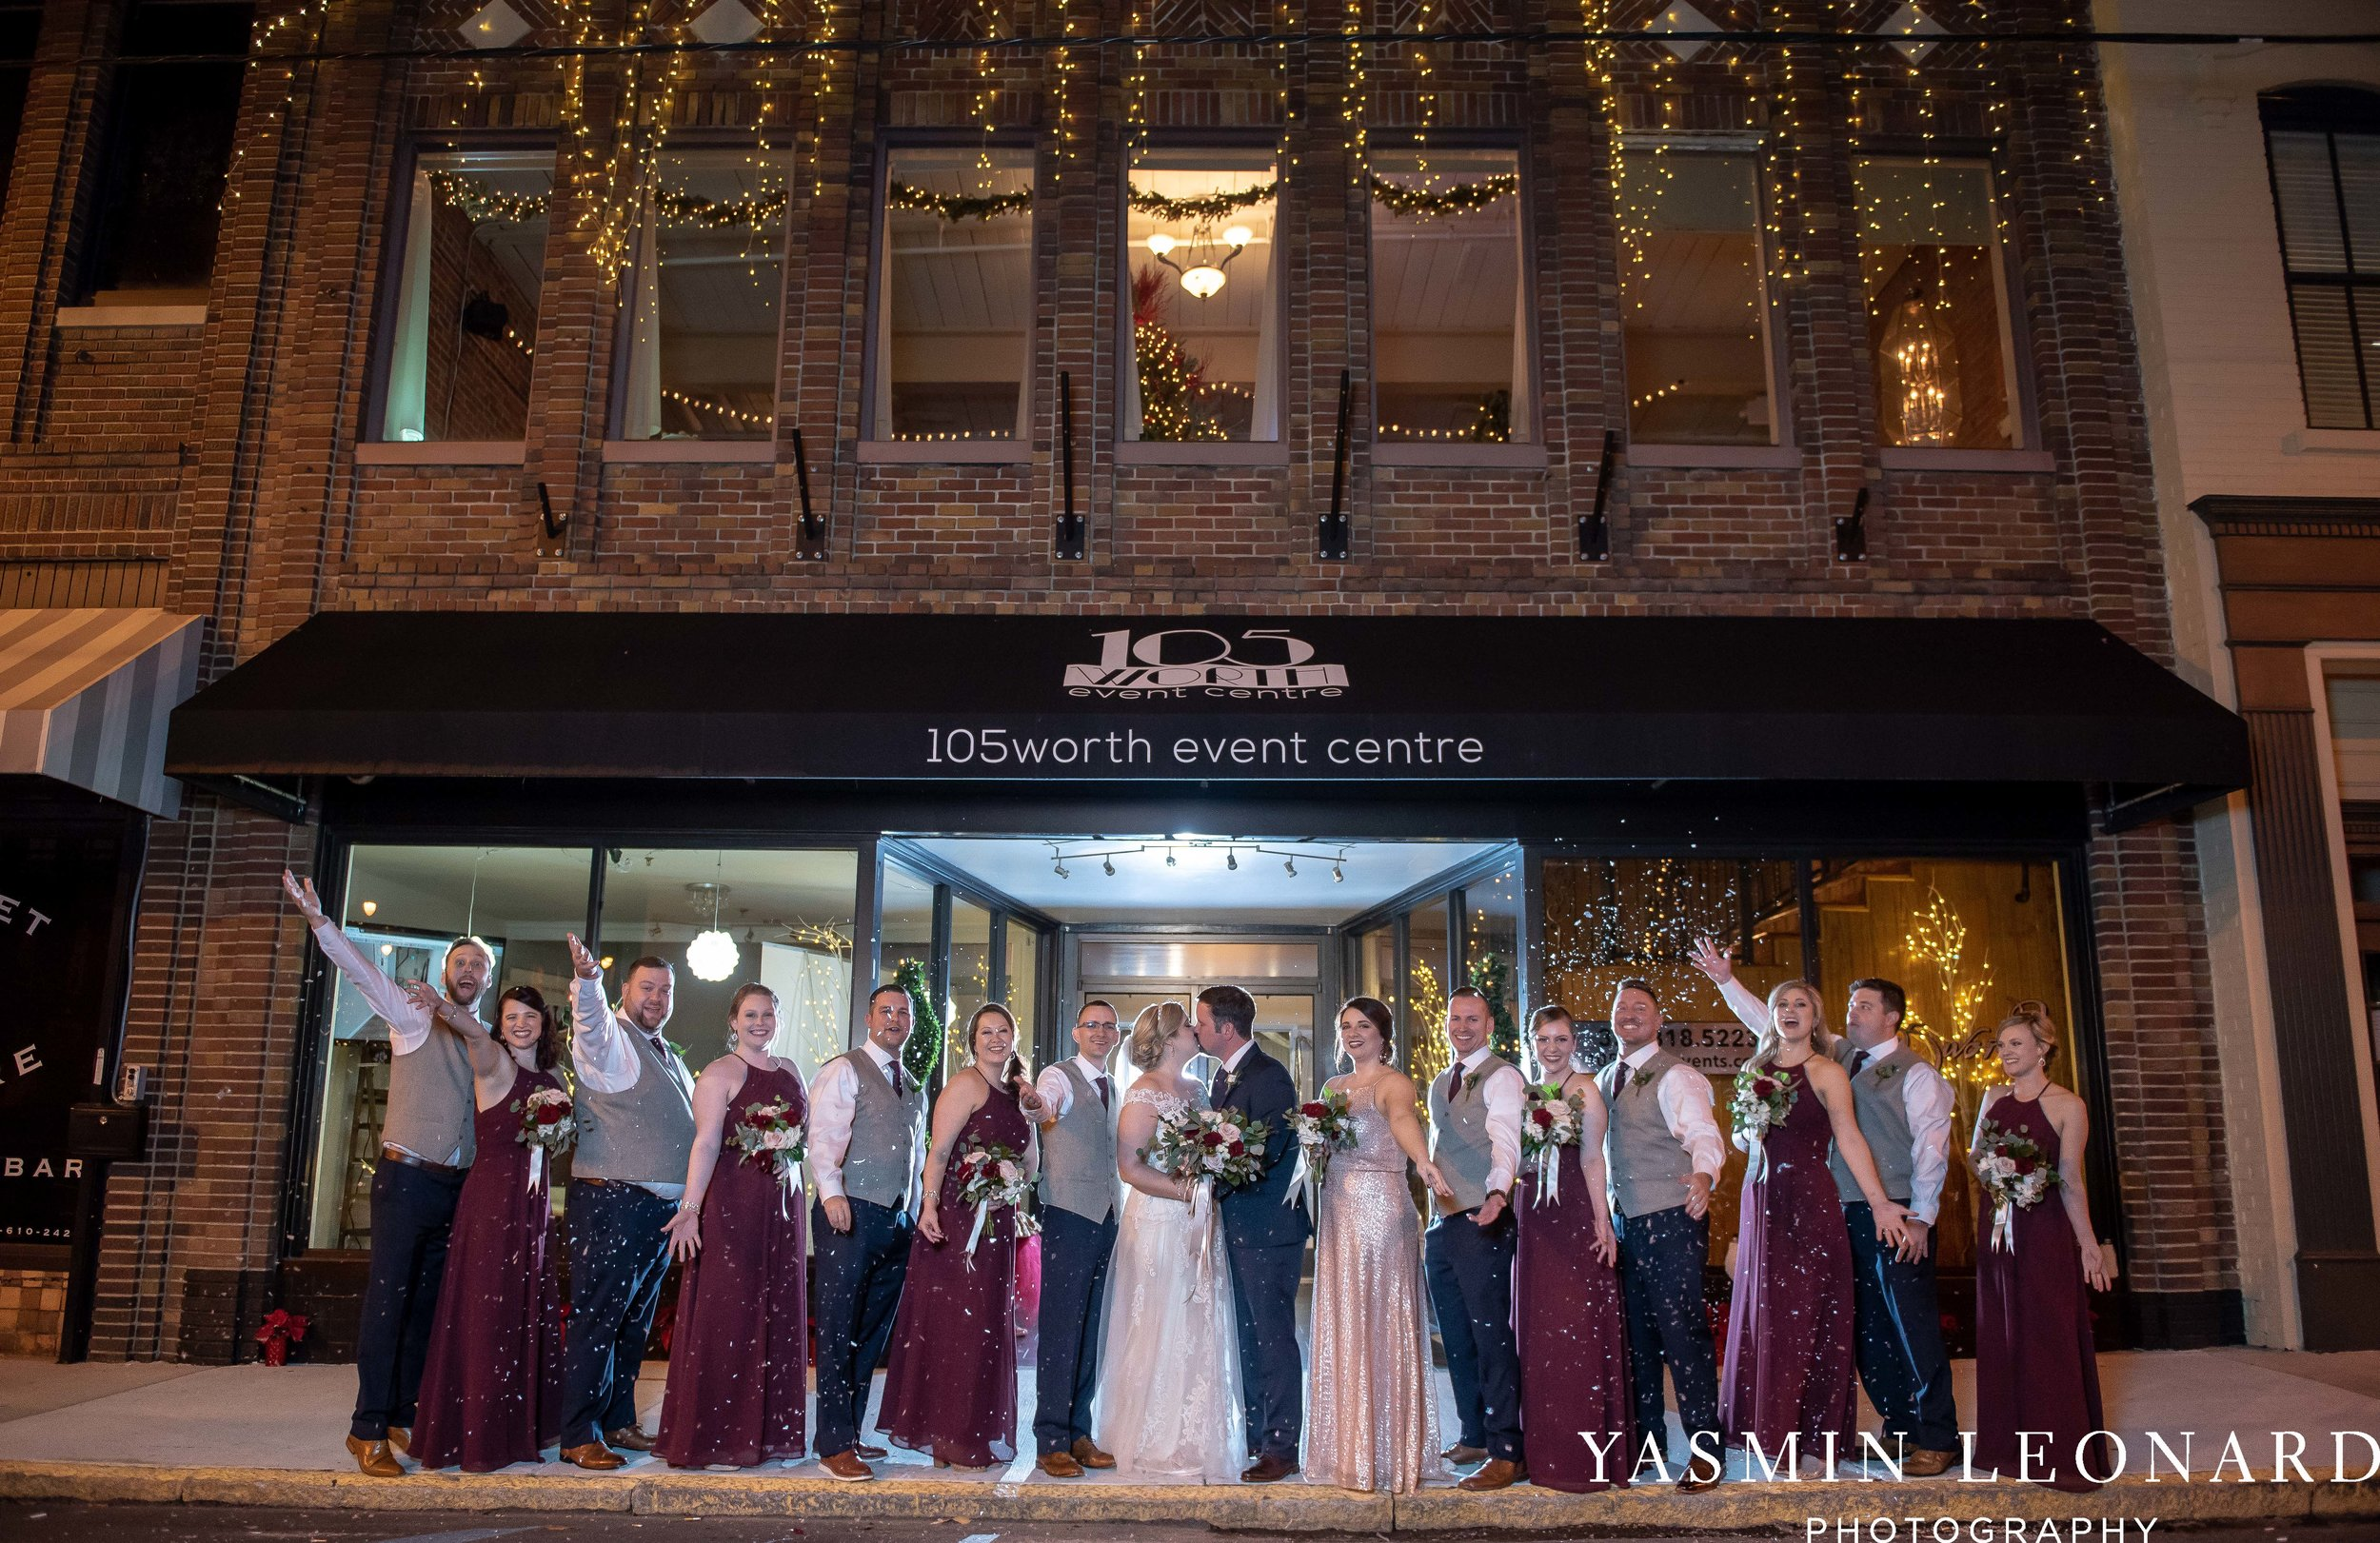 Rebekah and Matt - 105 Worth Event Centre - Yasmin Leonard Photography - Asheboro Wedding - NC Wedding - High Point Weddings - Triad Weddings - Winter Wedding-35.jpg